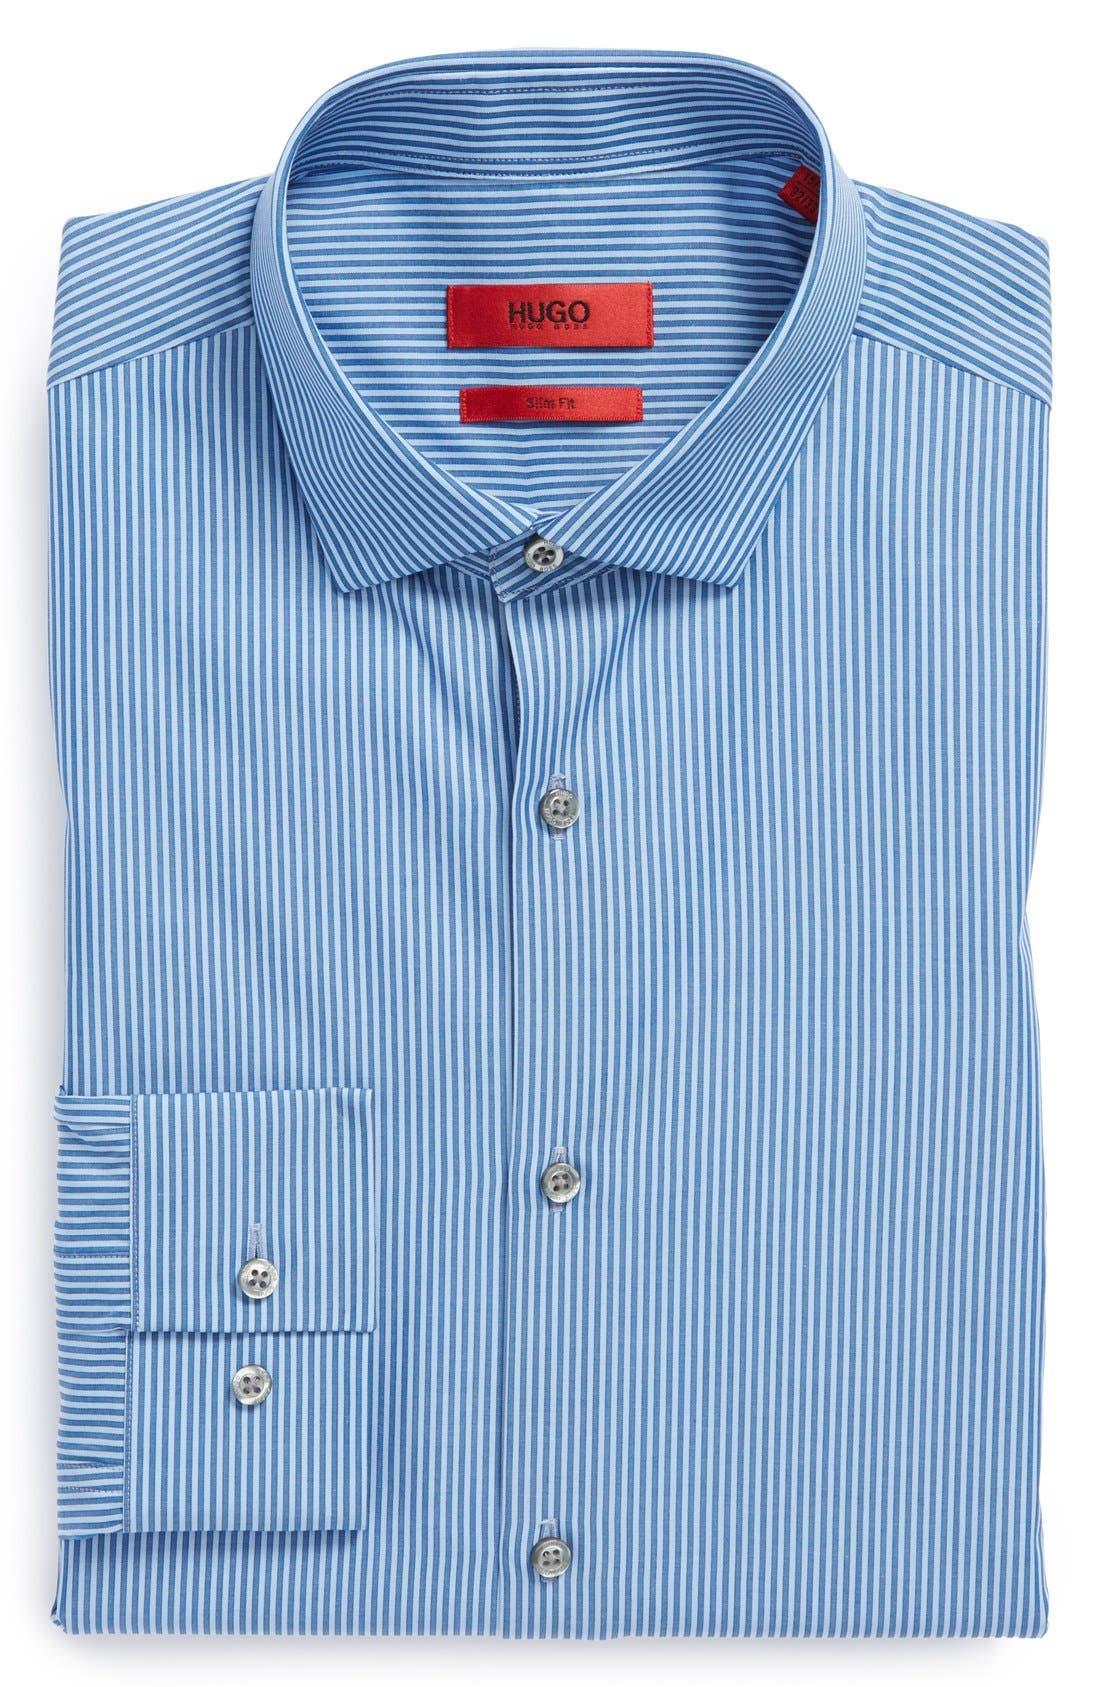 Alternate Image 1 Selected - HUGO BOSS EXTRIM DRESS SHIRT